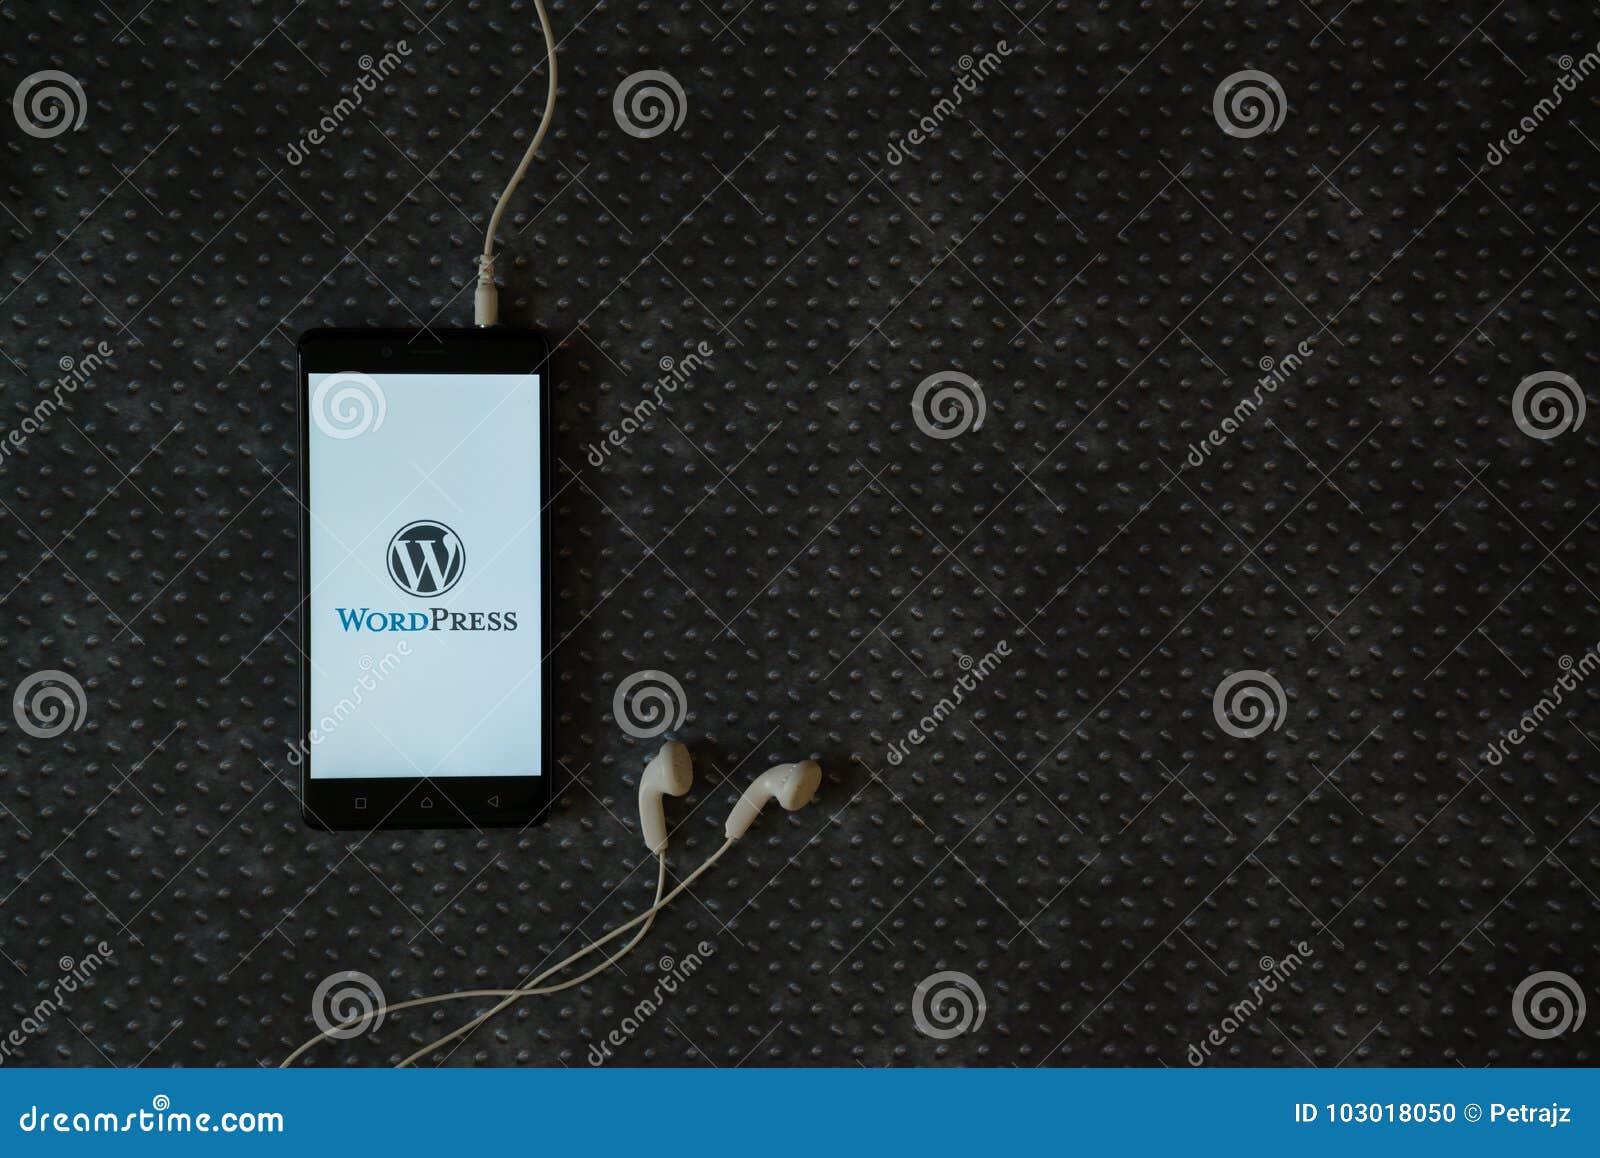 wordpress logo on smartphone screen editorial image